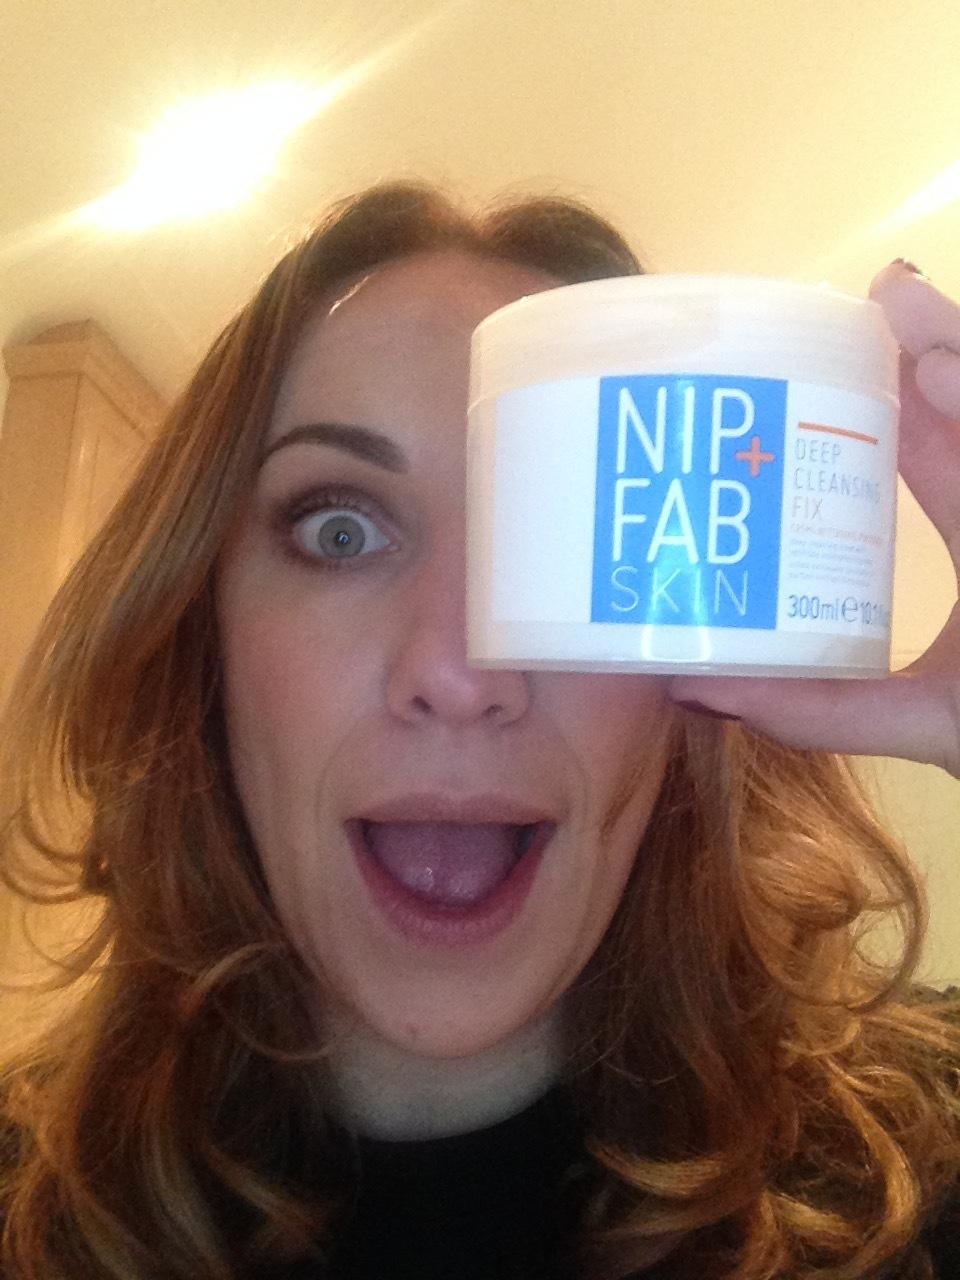 Nip+Fab Deep Cleansing Fix